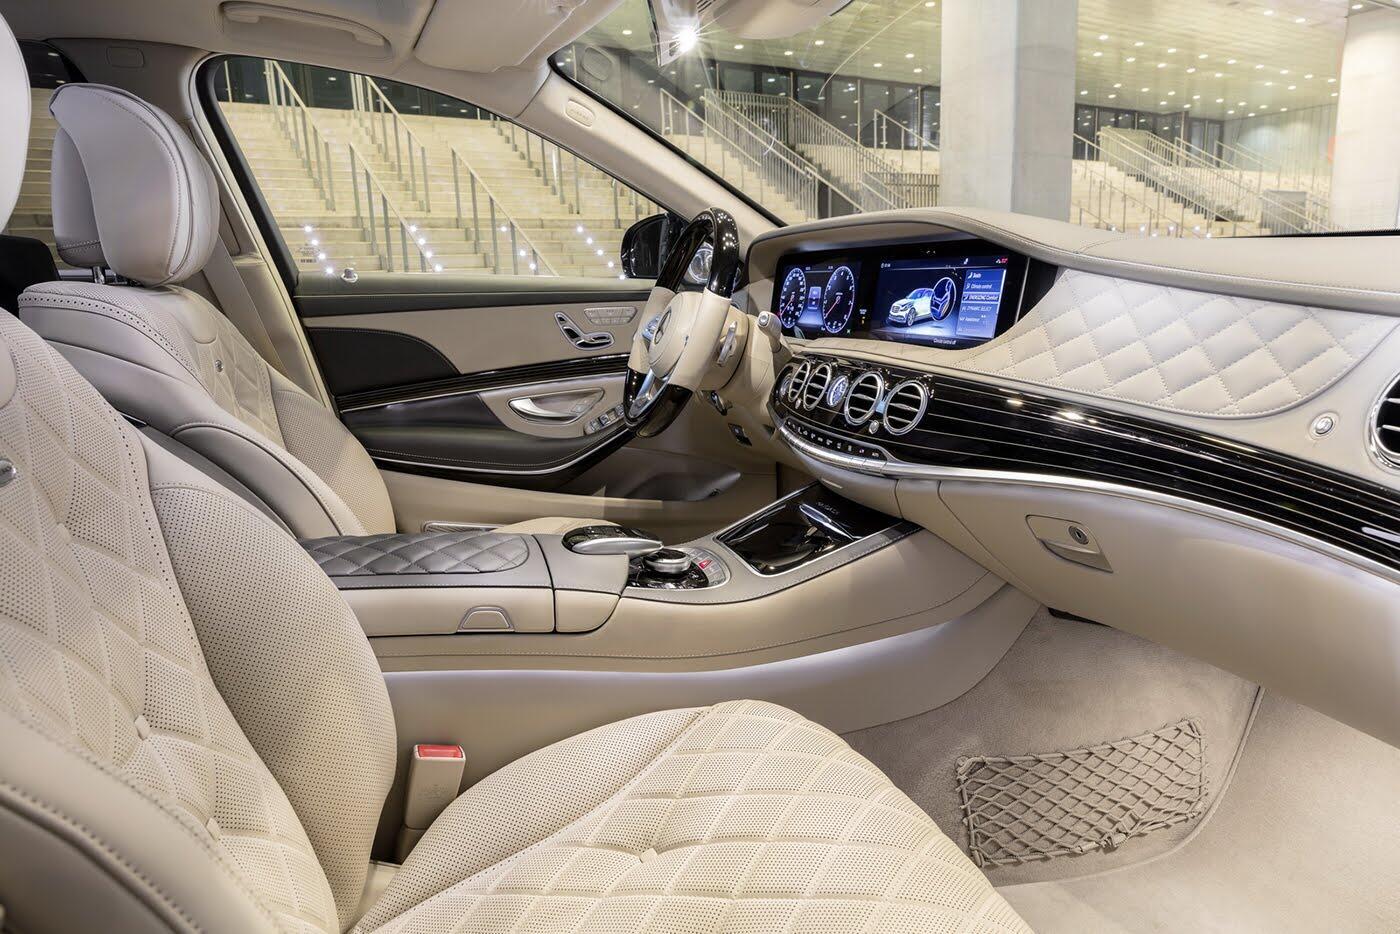 Ảnh chi tiết Mercedes-Benz S-Class 2018 - Hình 15